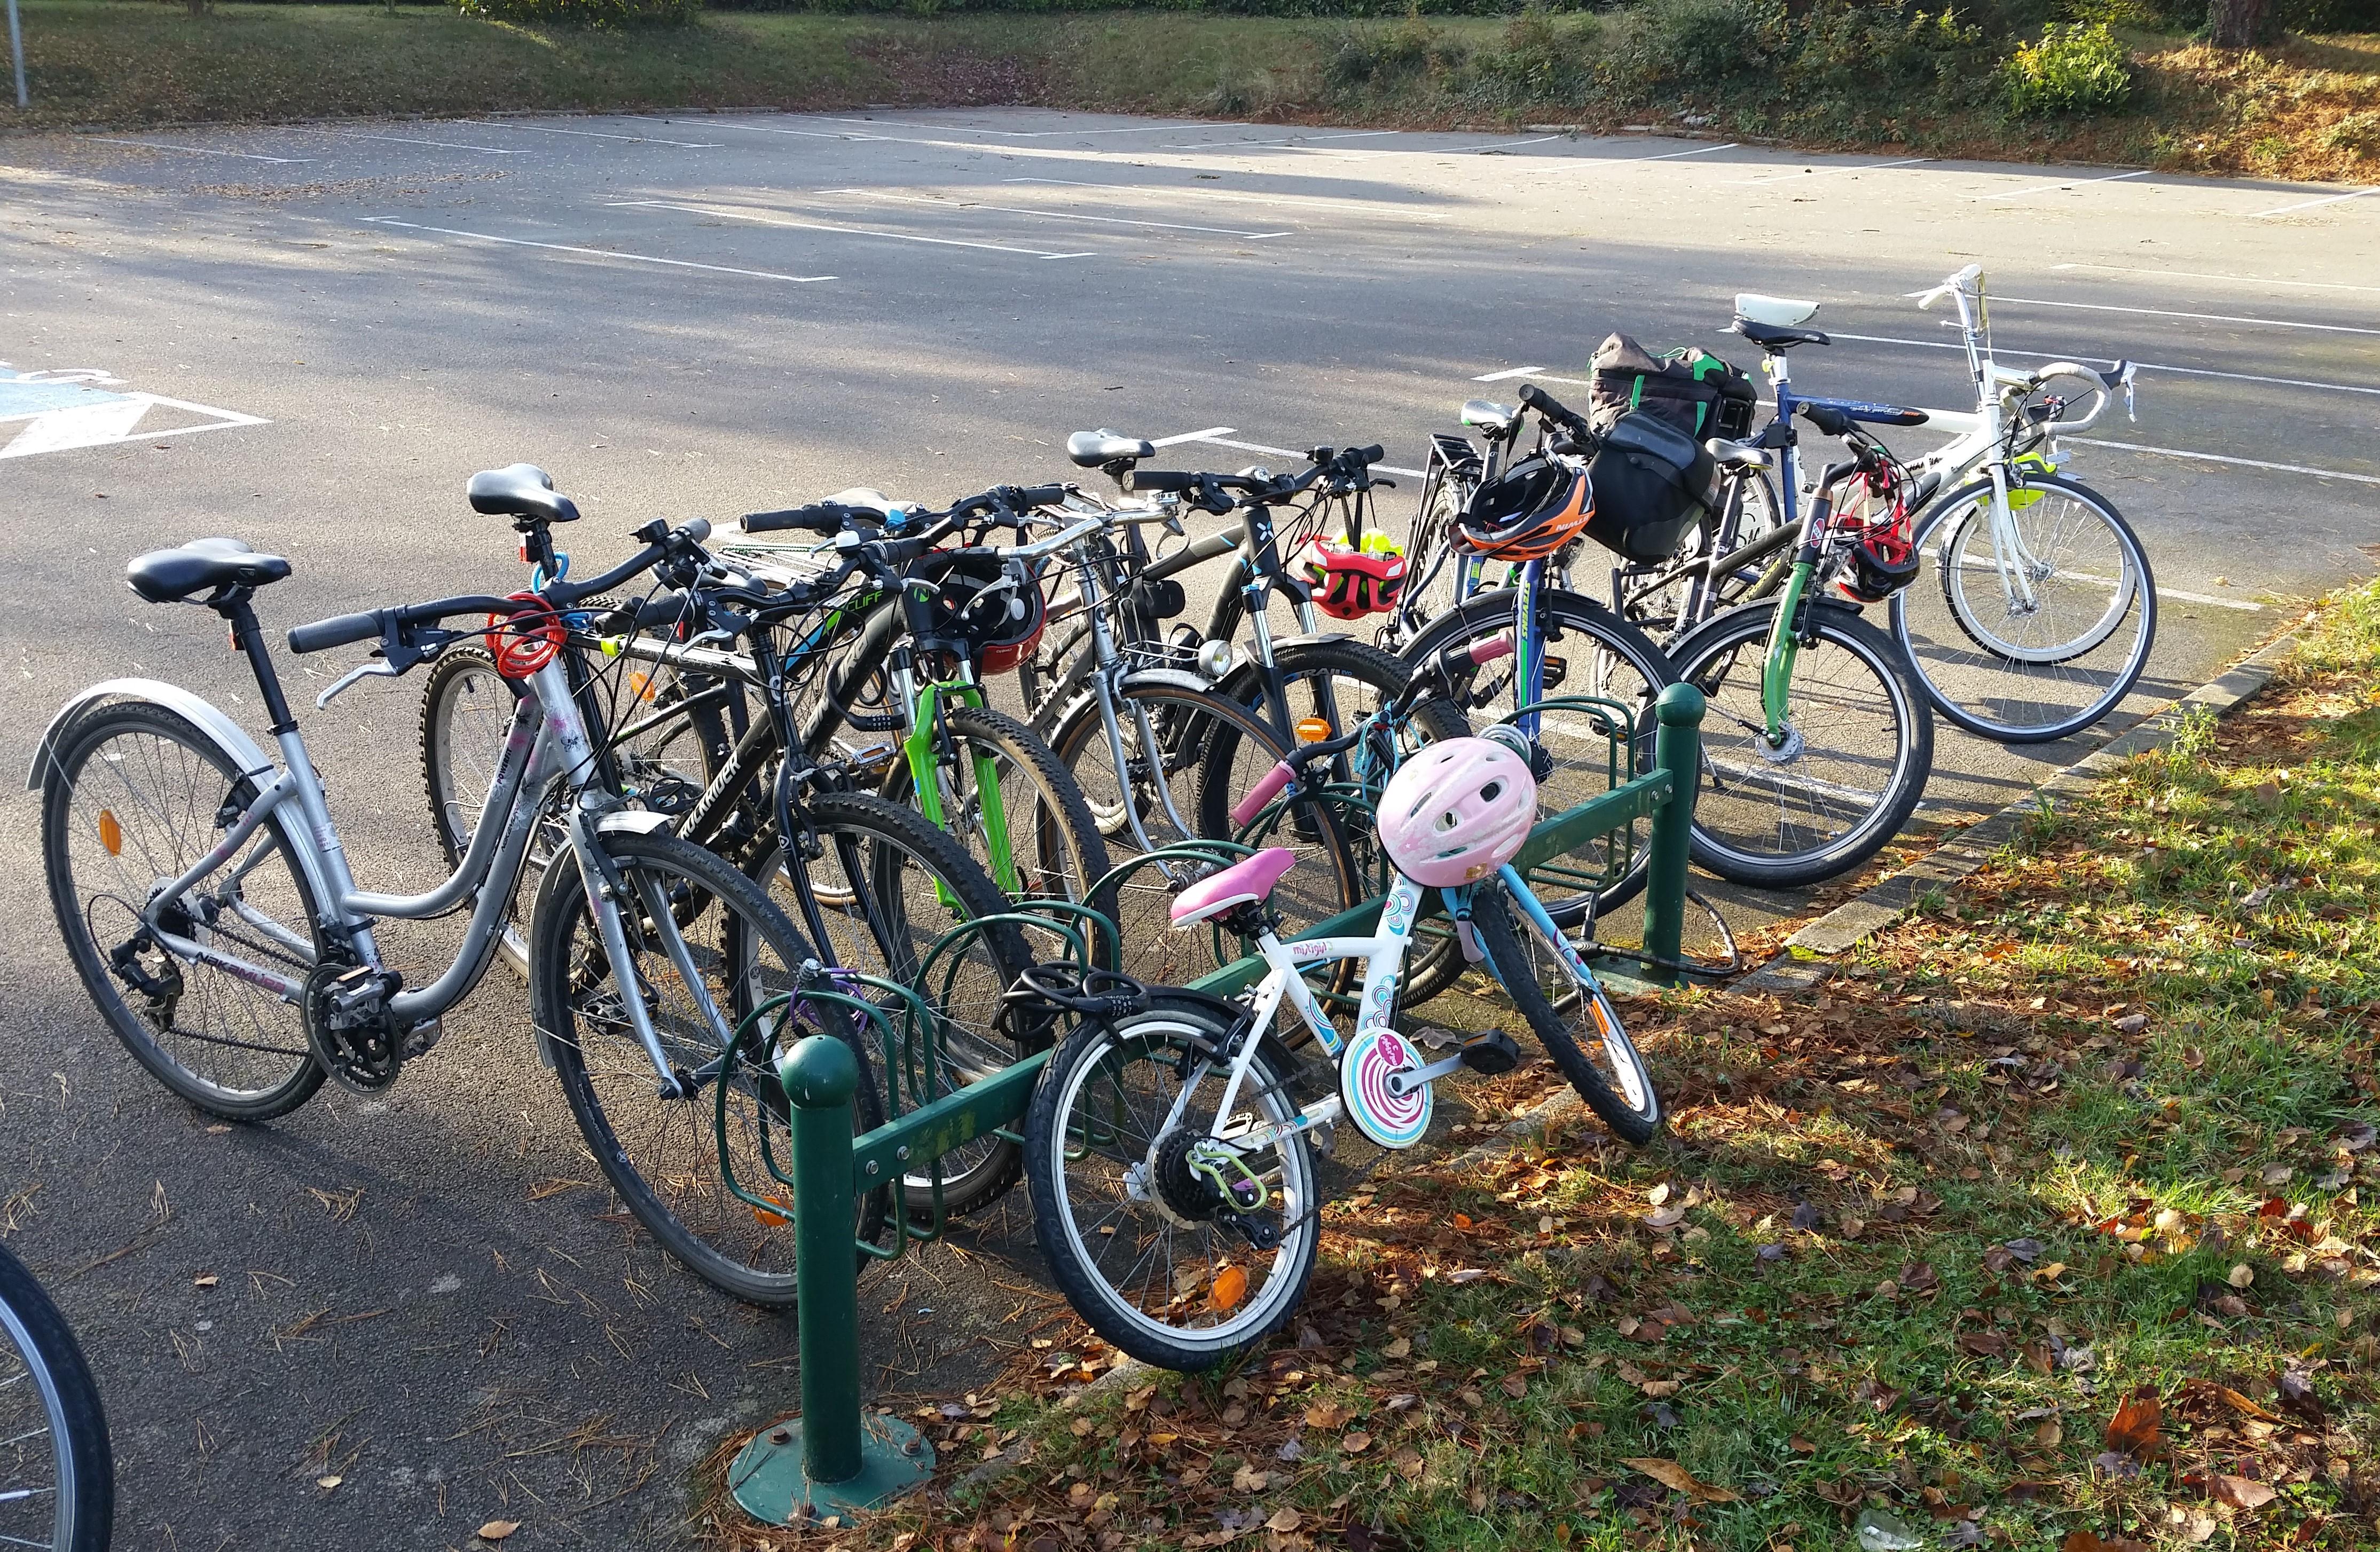 Mathilda – Garage à Vélo